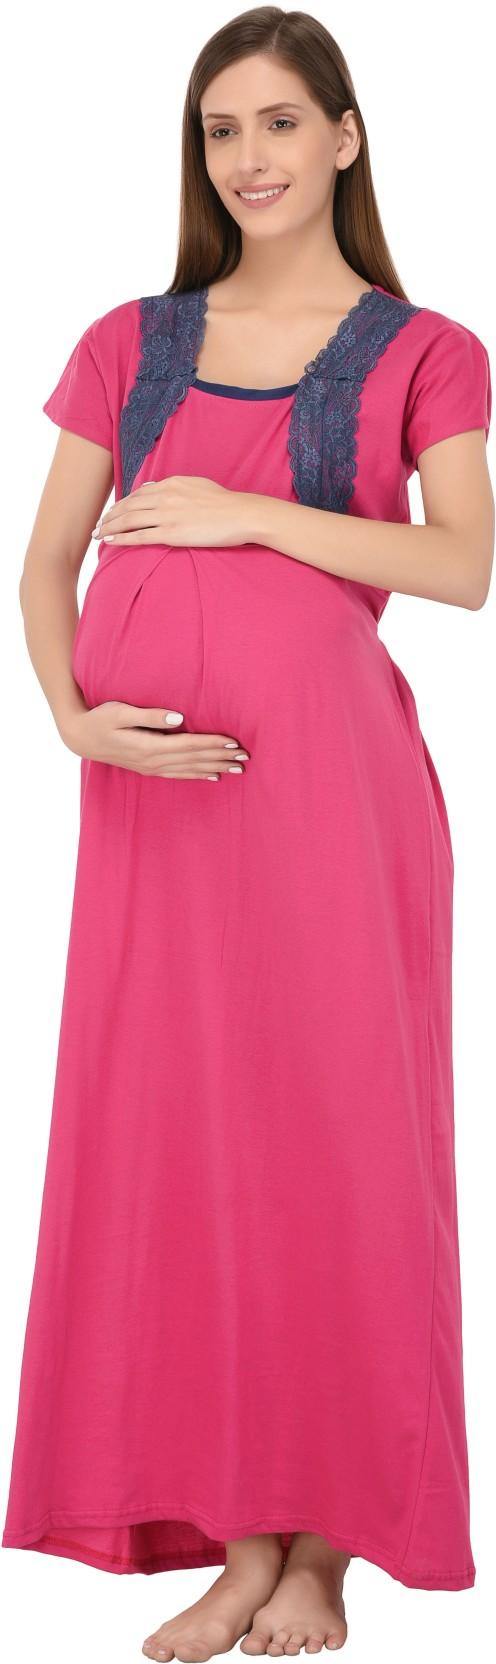 c246e942702 Fabme Women Maternity Nursing Nighty - Buy Fabme Women Maternity ...